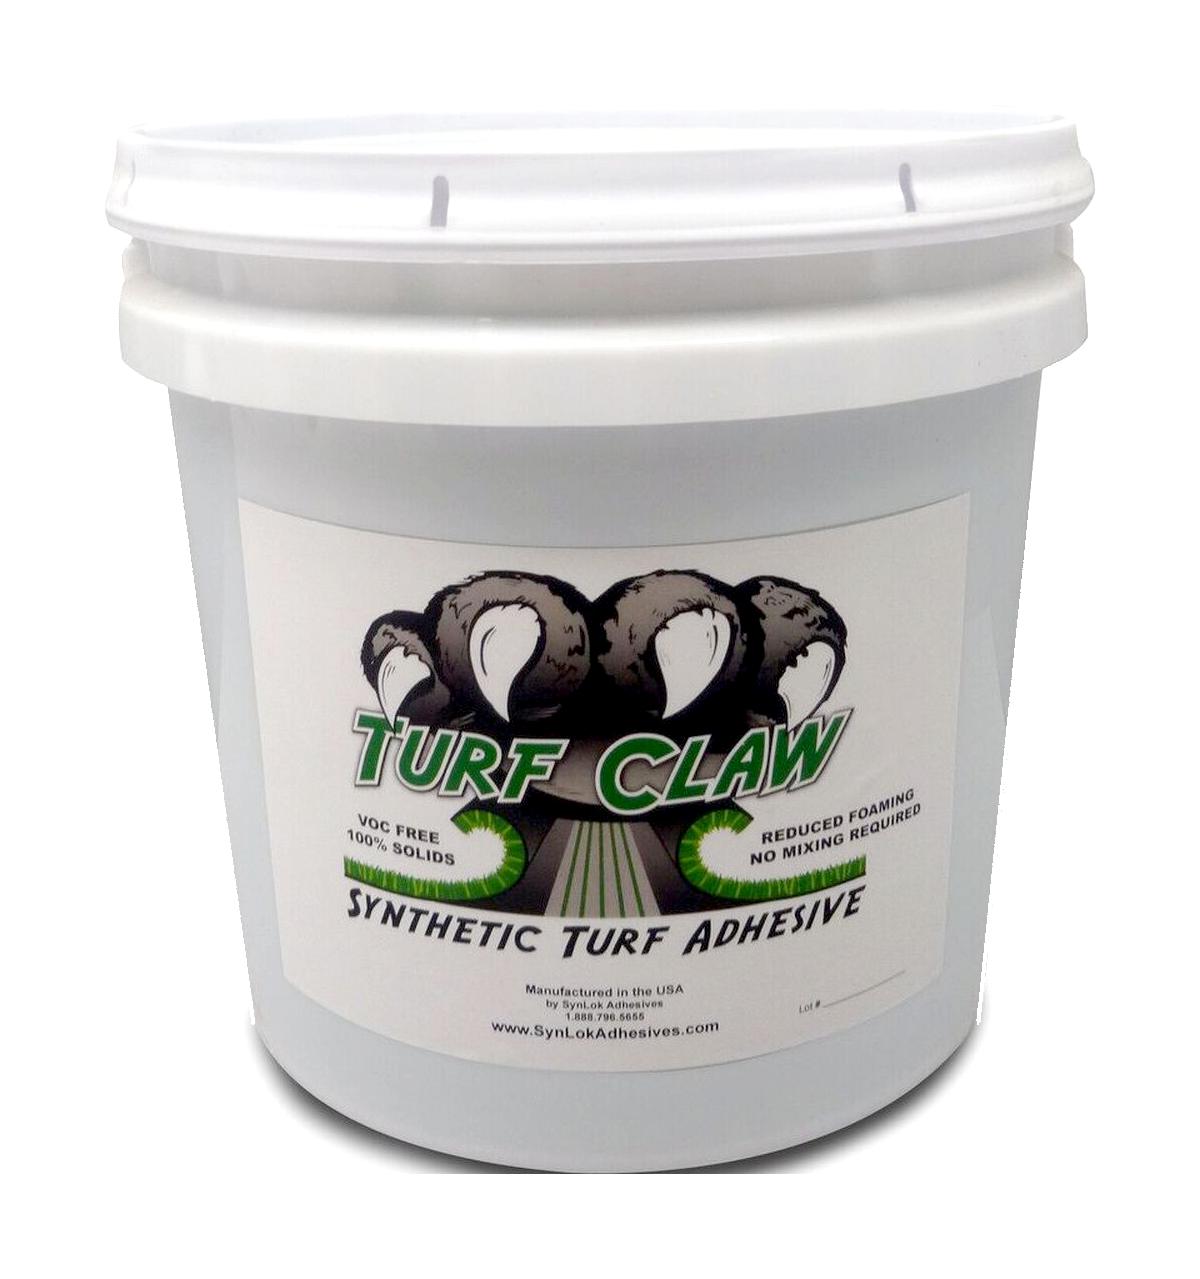 Turf-claw-2-gallon__89133.1563970877